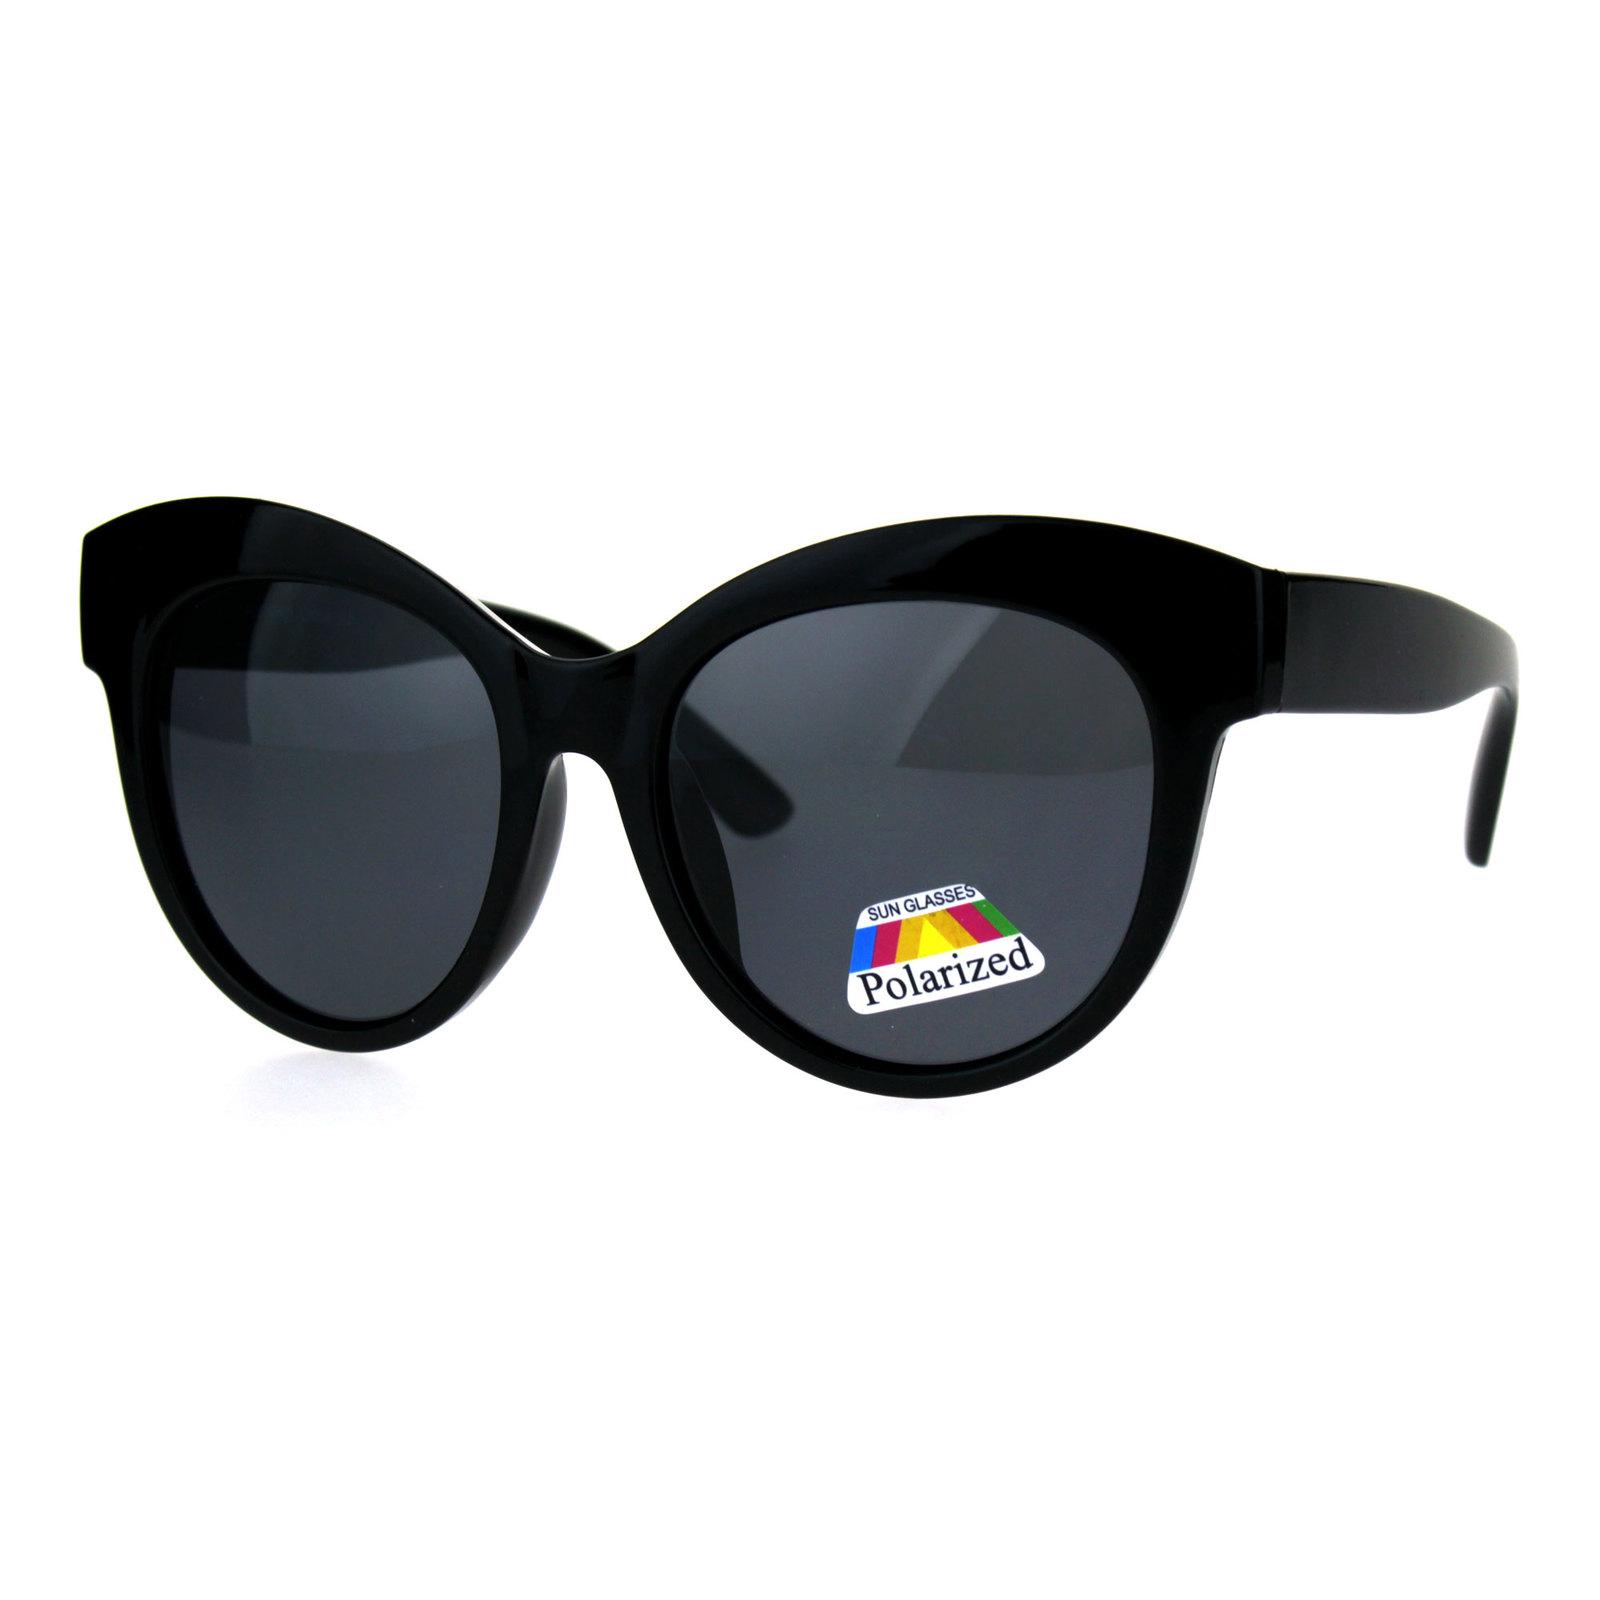 Antiglare Polarized Oversize Thick Plastic Cat Eye Diva Sunglasses